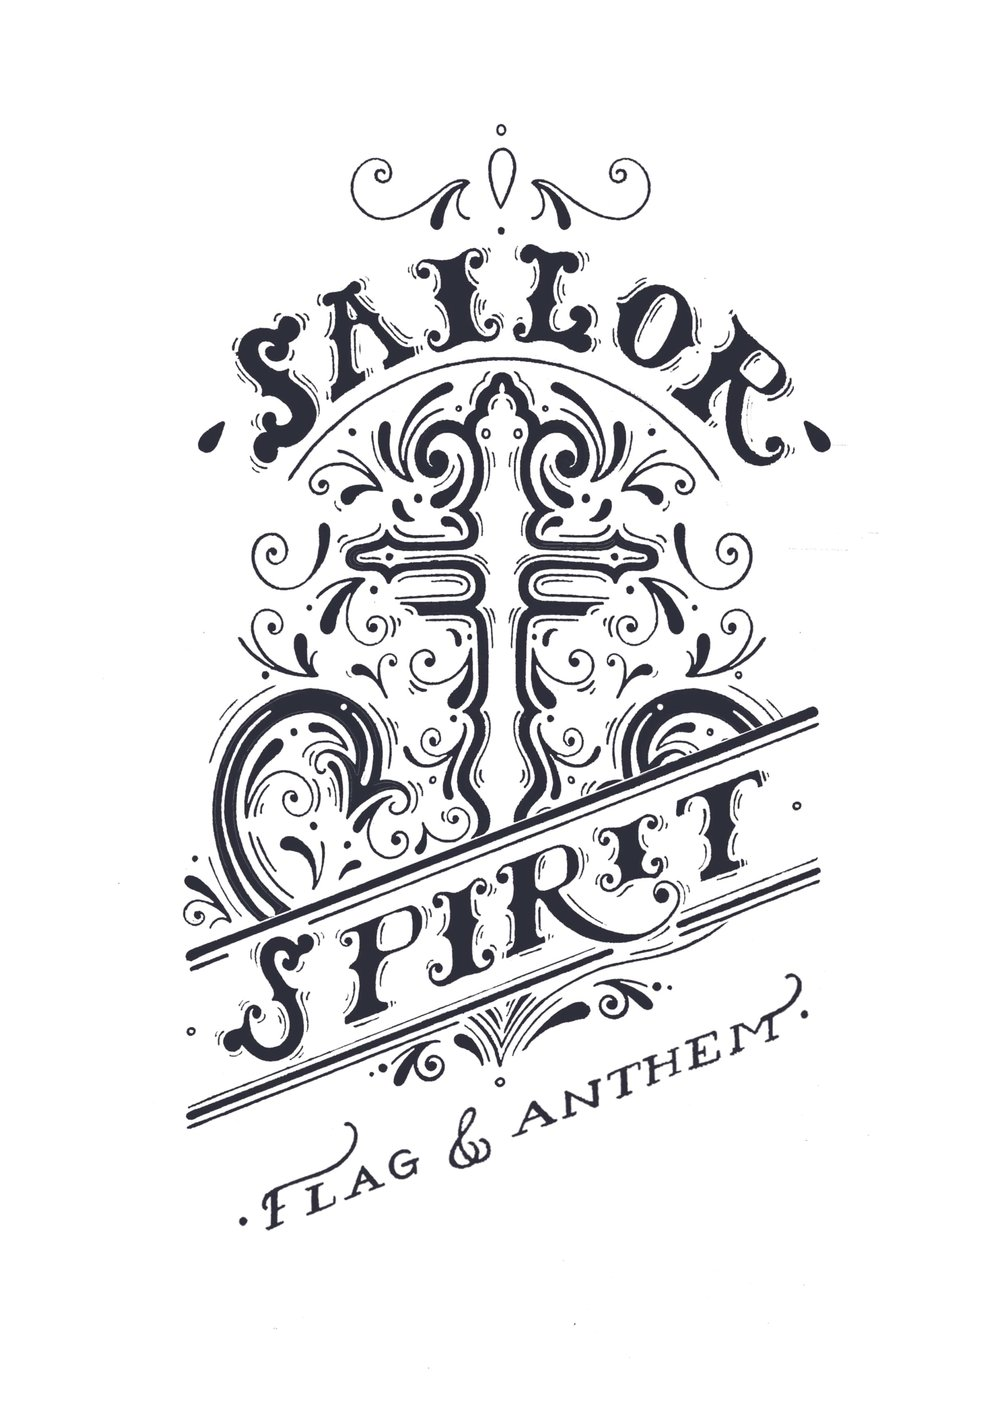 Sailor Spirit - Nautical Typographic Clothing design for Flag & Anthem Clothing,2016.